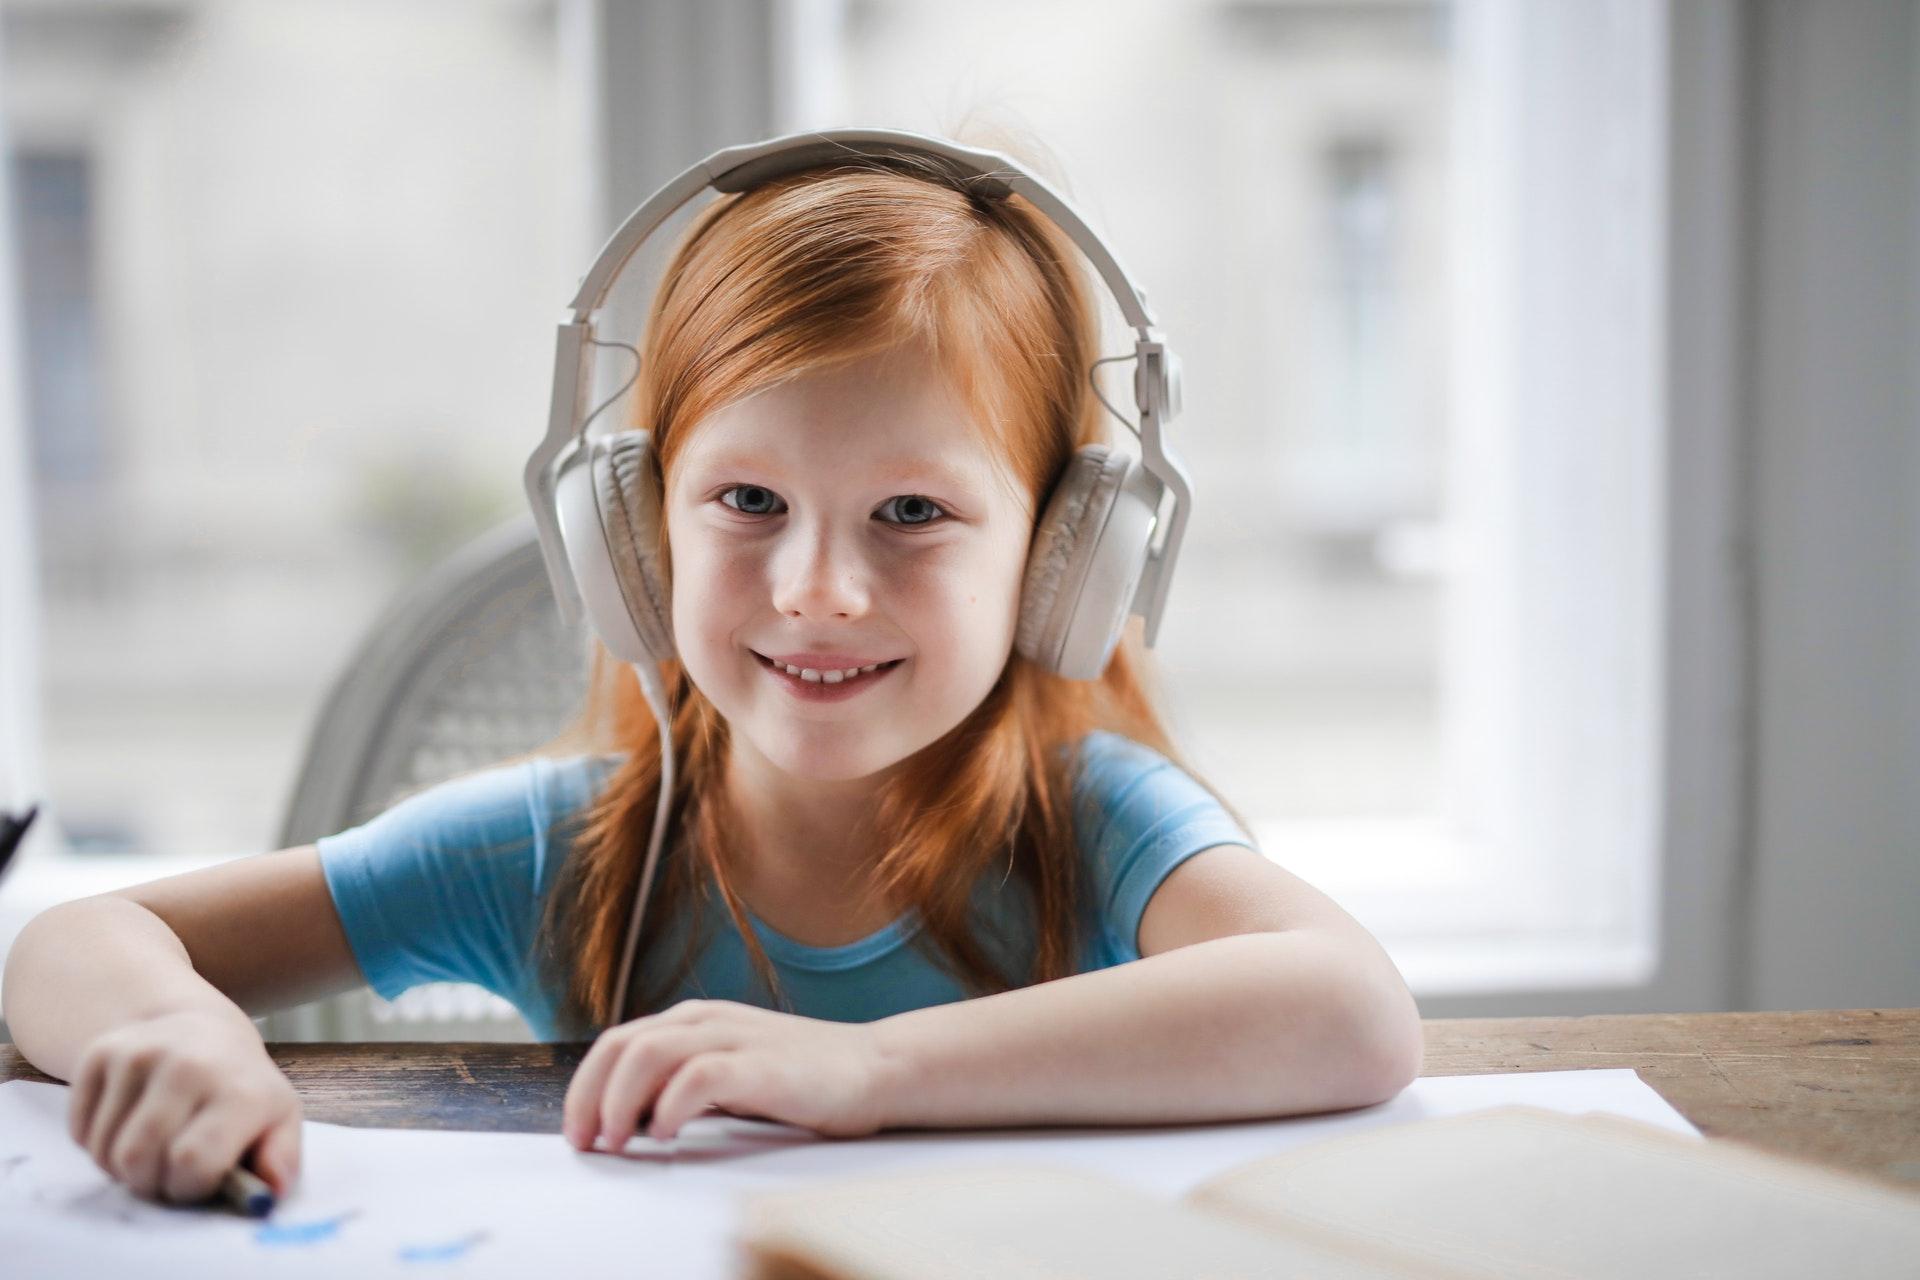 Keys for Kids Radio: where faith meets fun